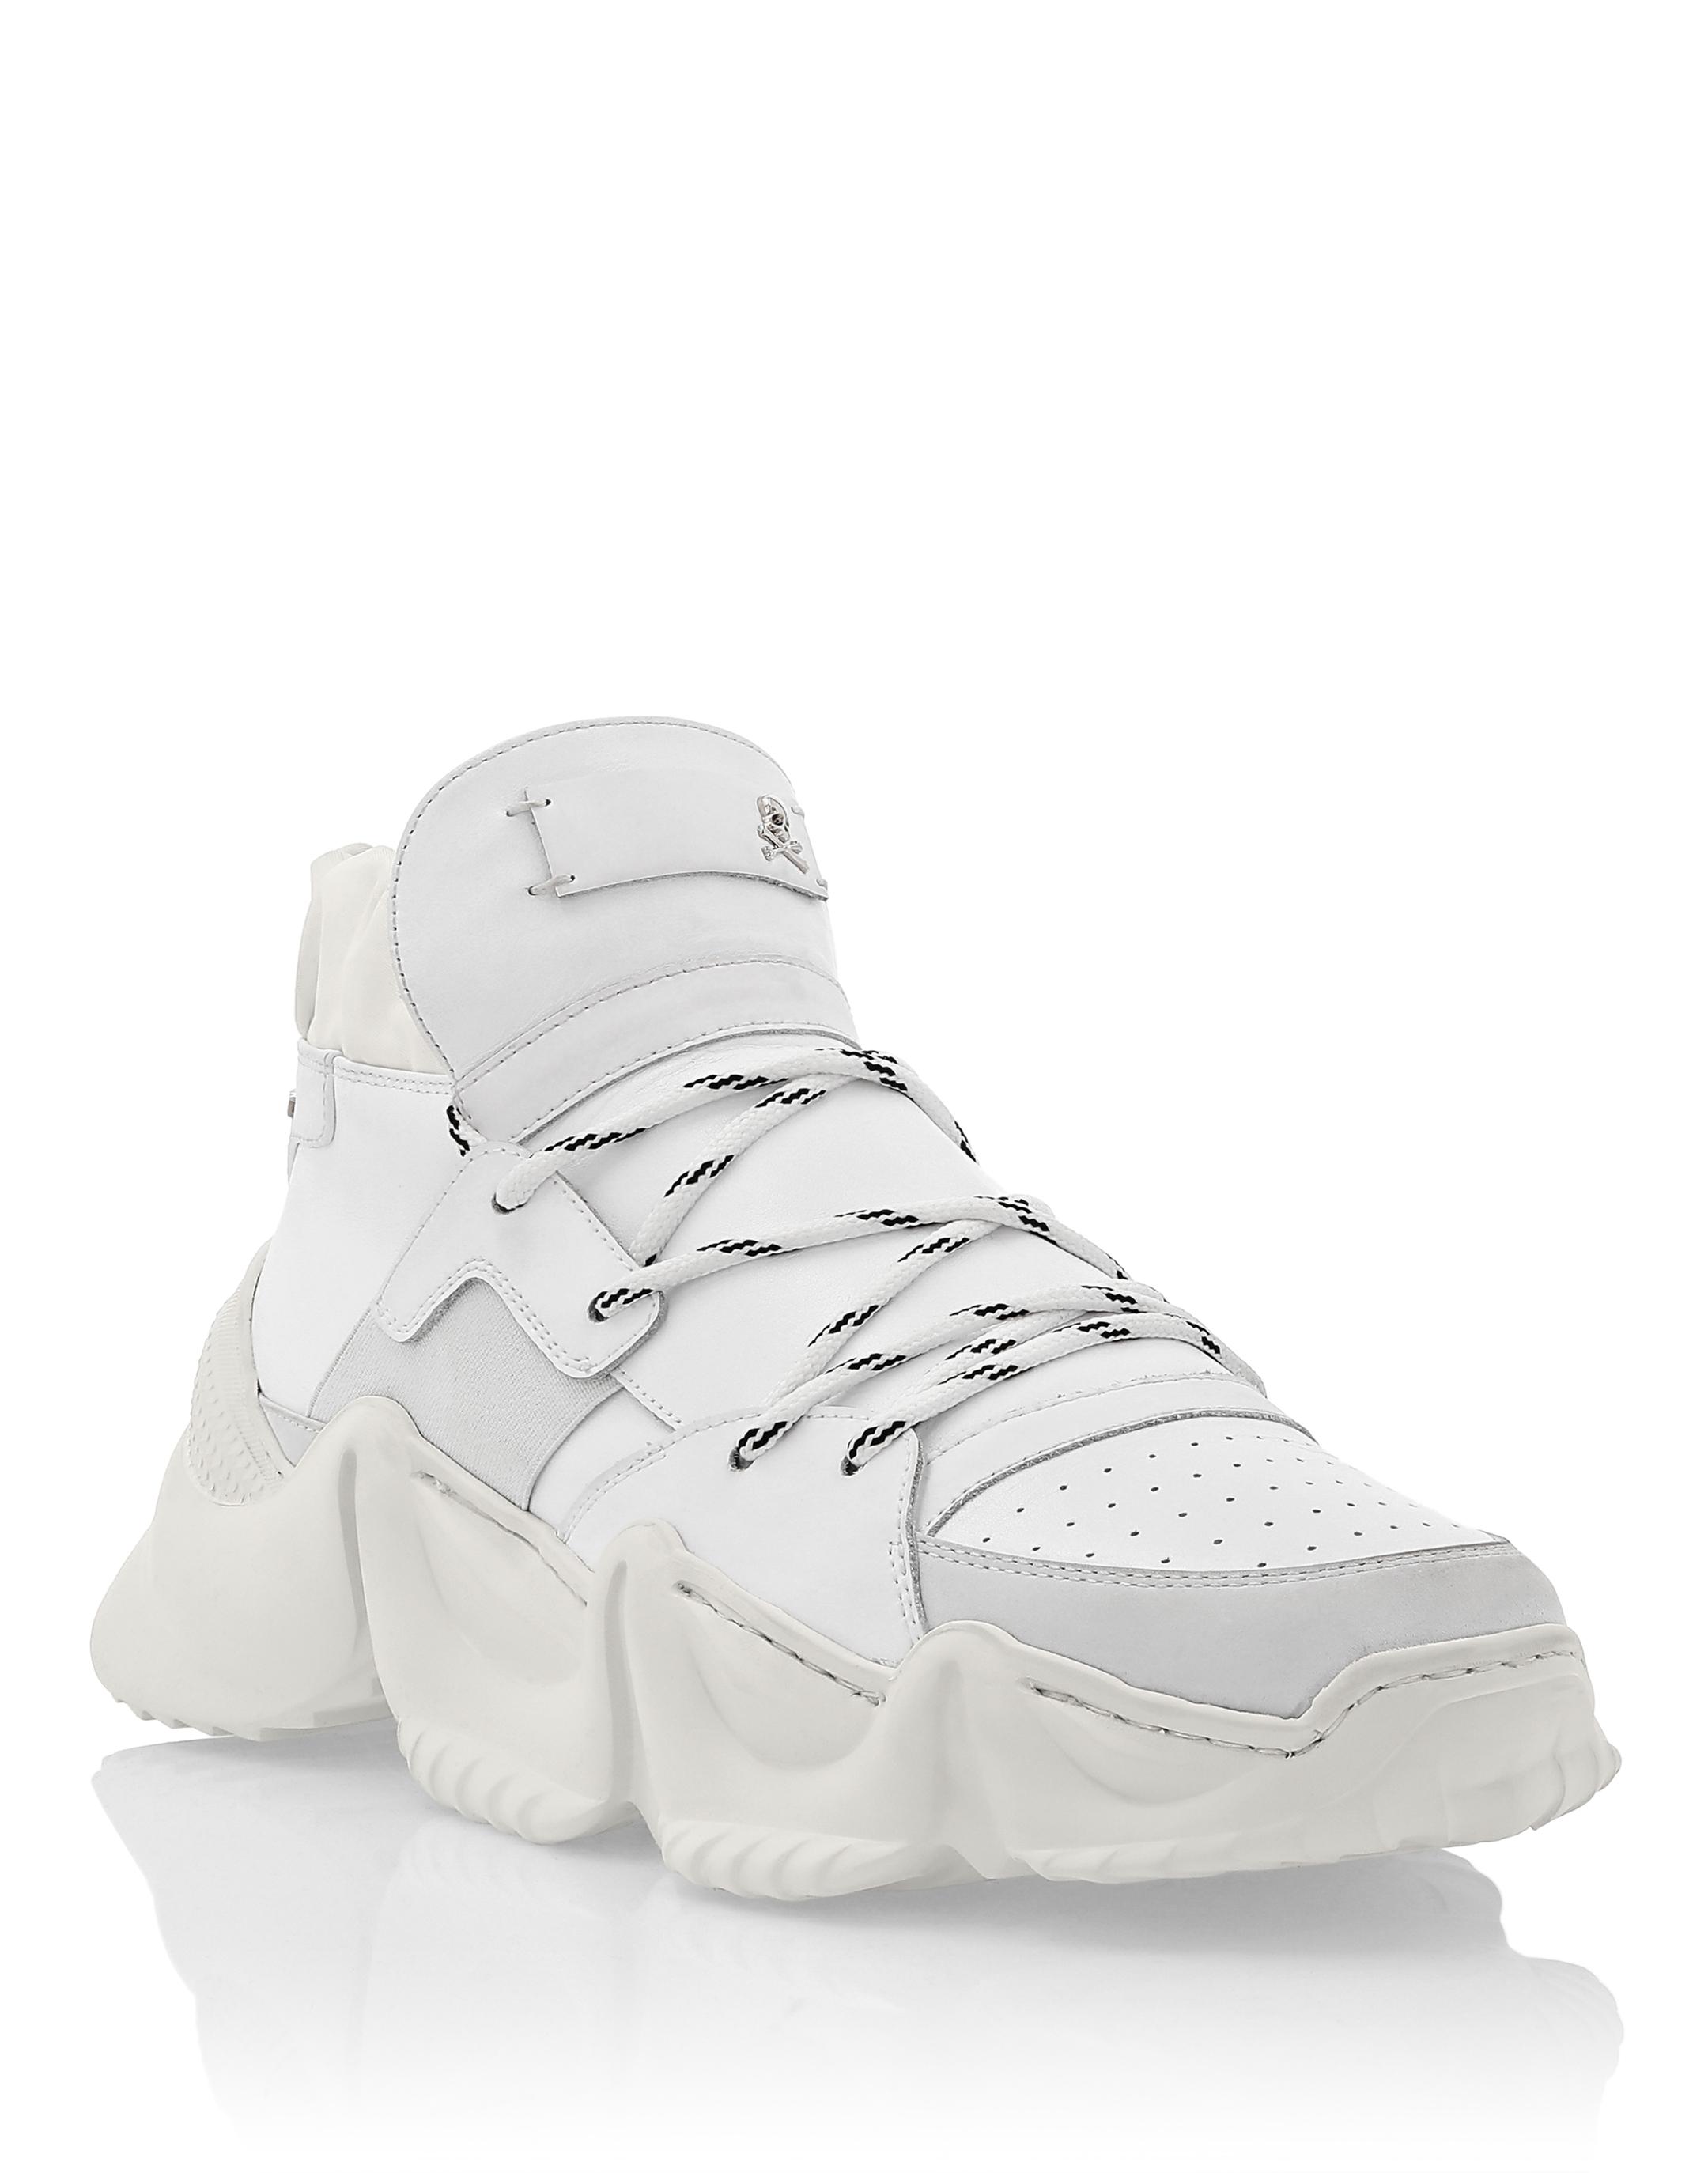 84a32df2253 Hi-Top Sneakers Monster 0.2 | Philipp Plein